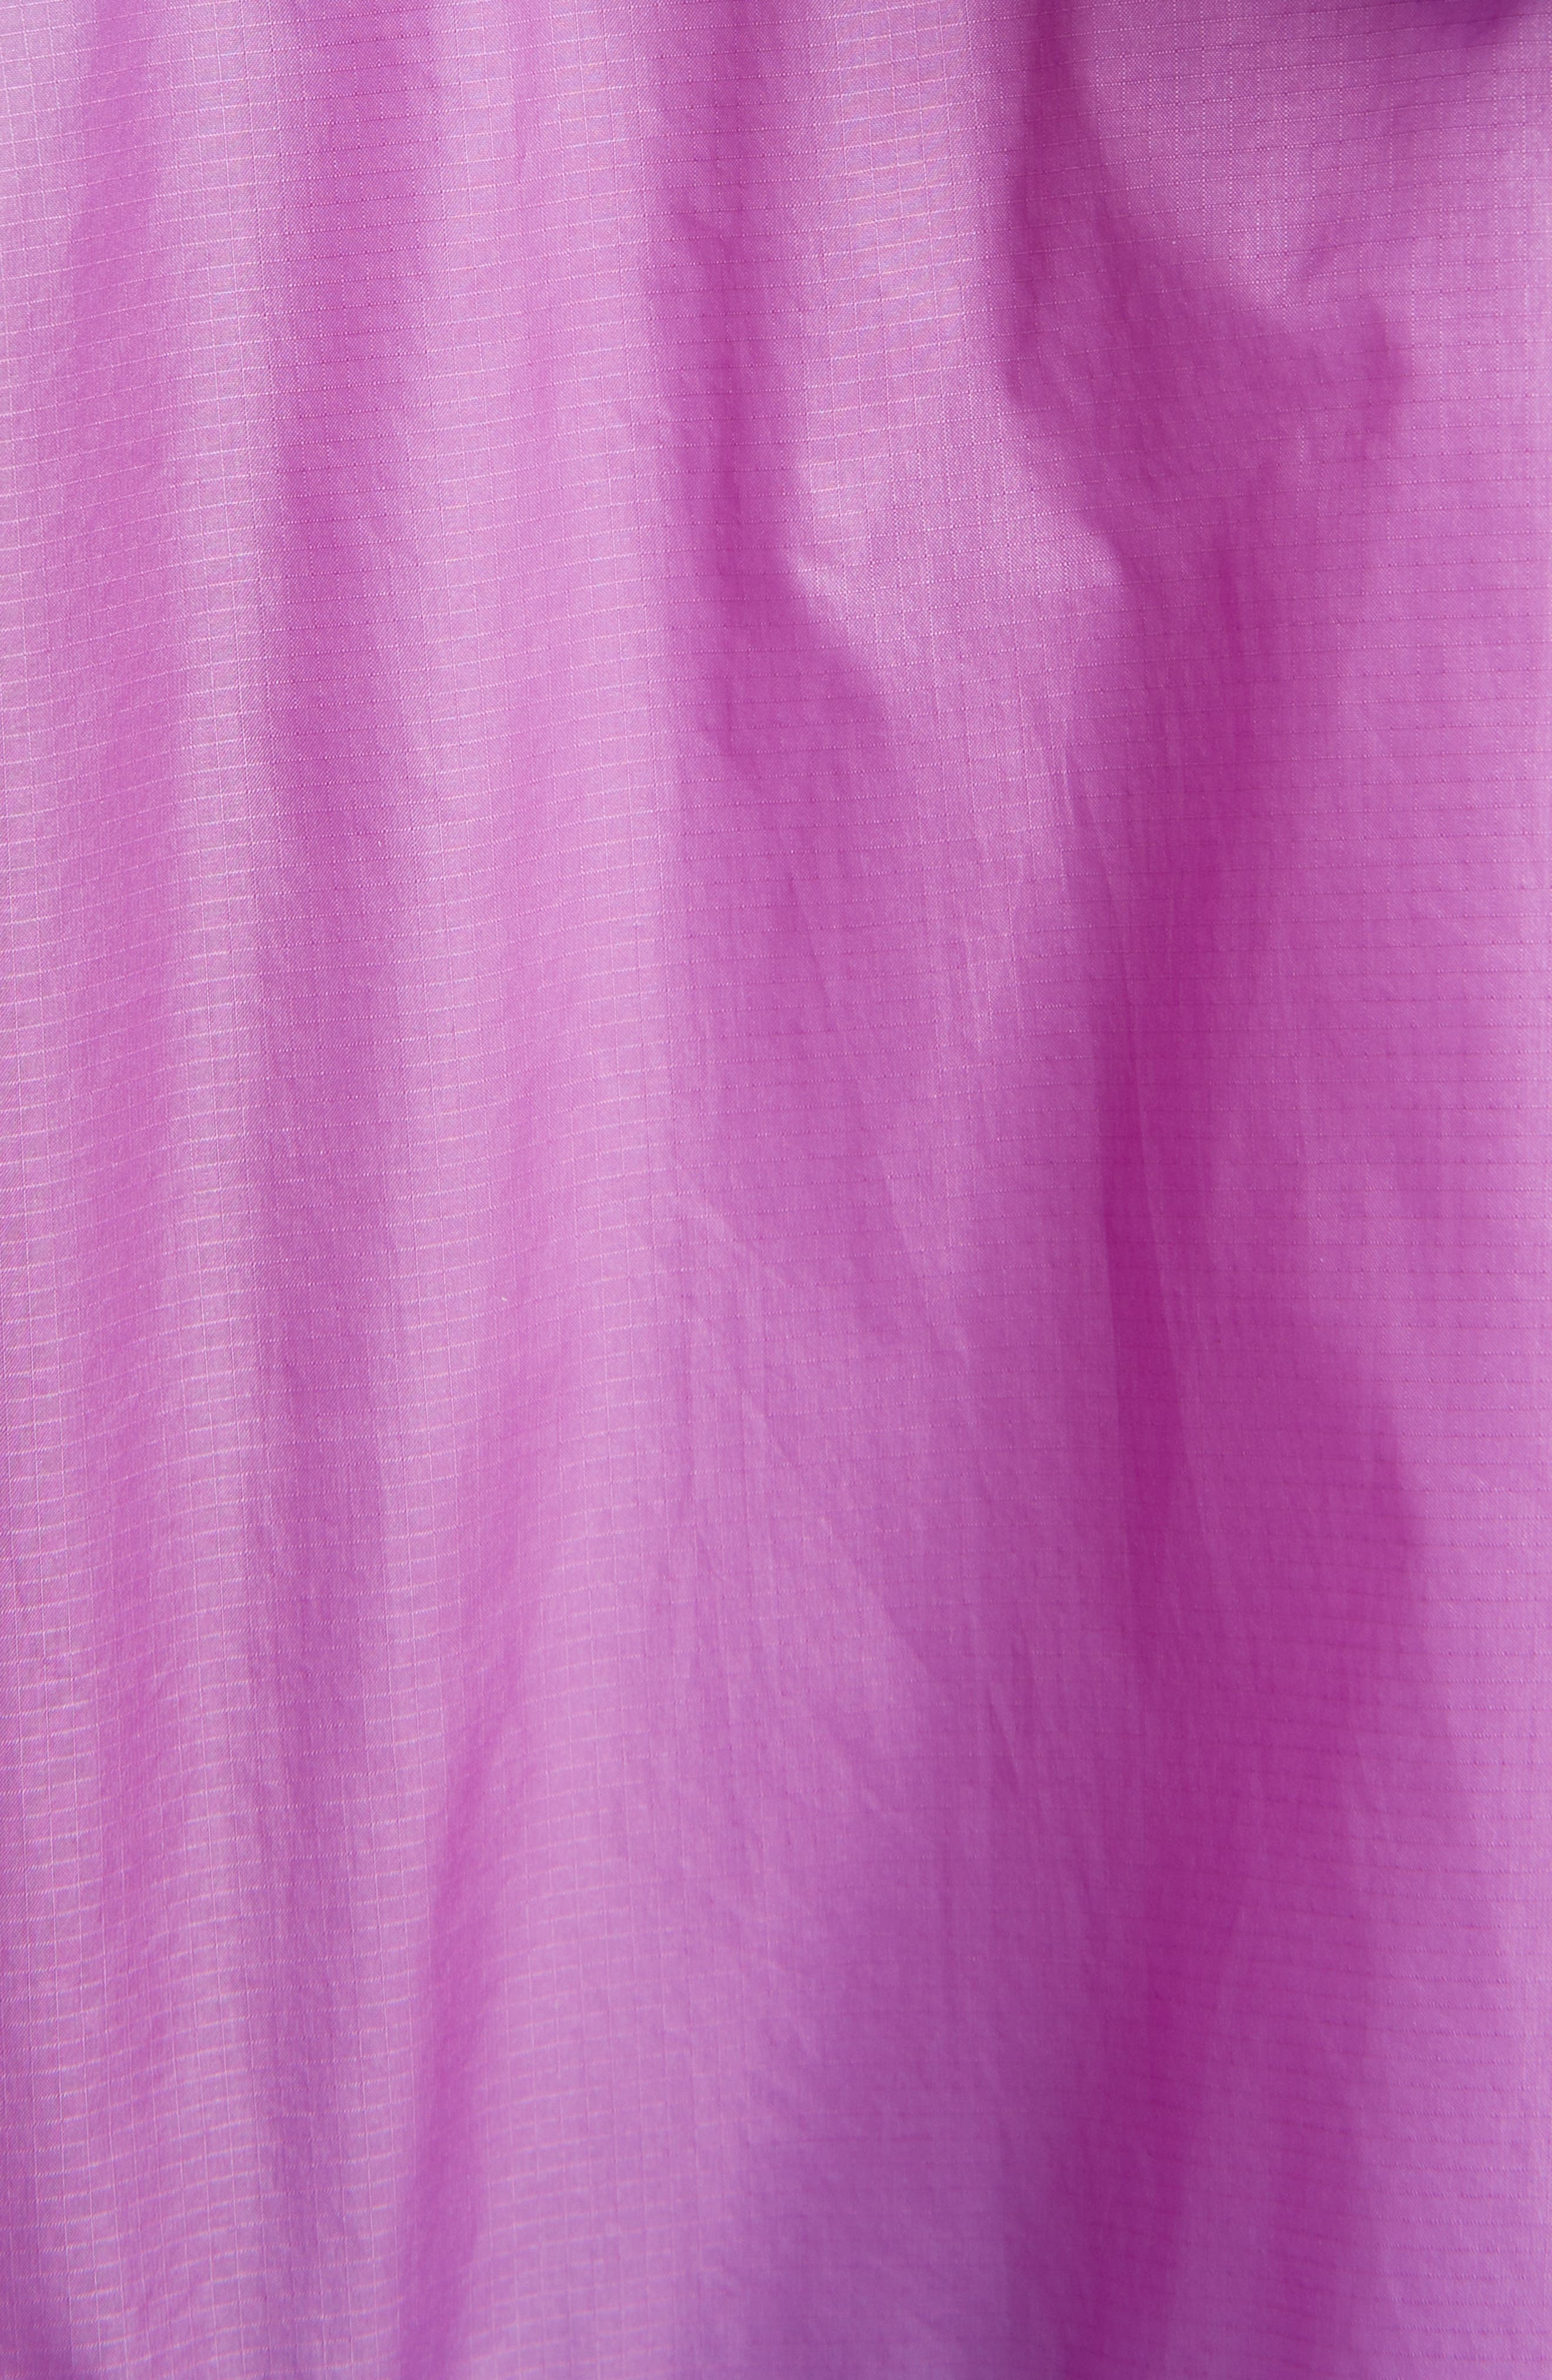 ISABEL MARANT ÉTOILE, Kyriel Colorblock Hooded Jacket, Alternate thumbnail 7, color, ELECTRIC BLUE/ VIOLET